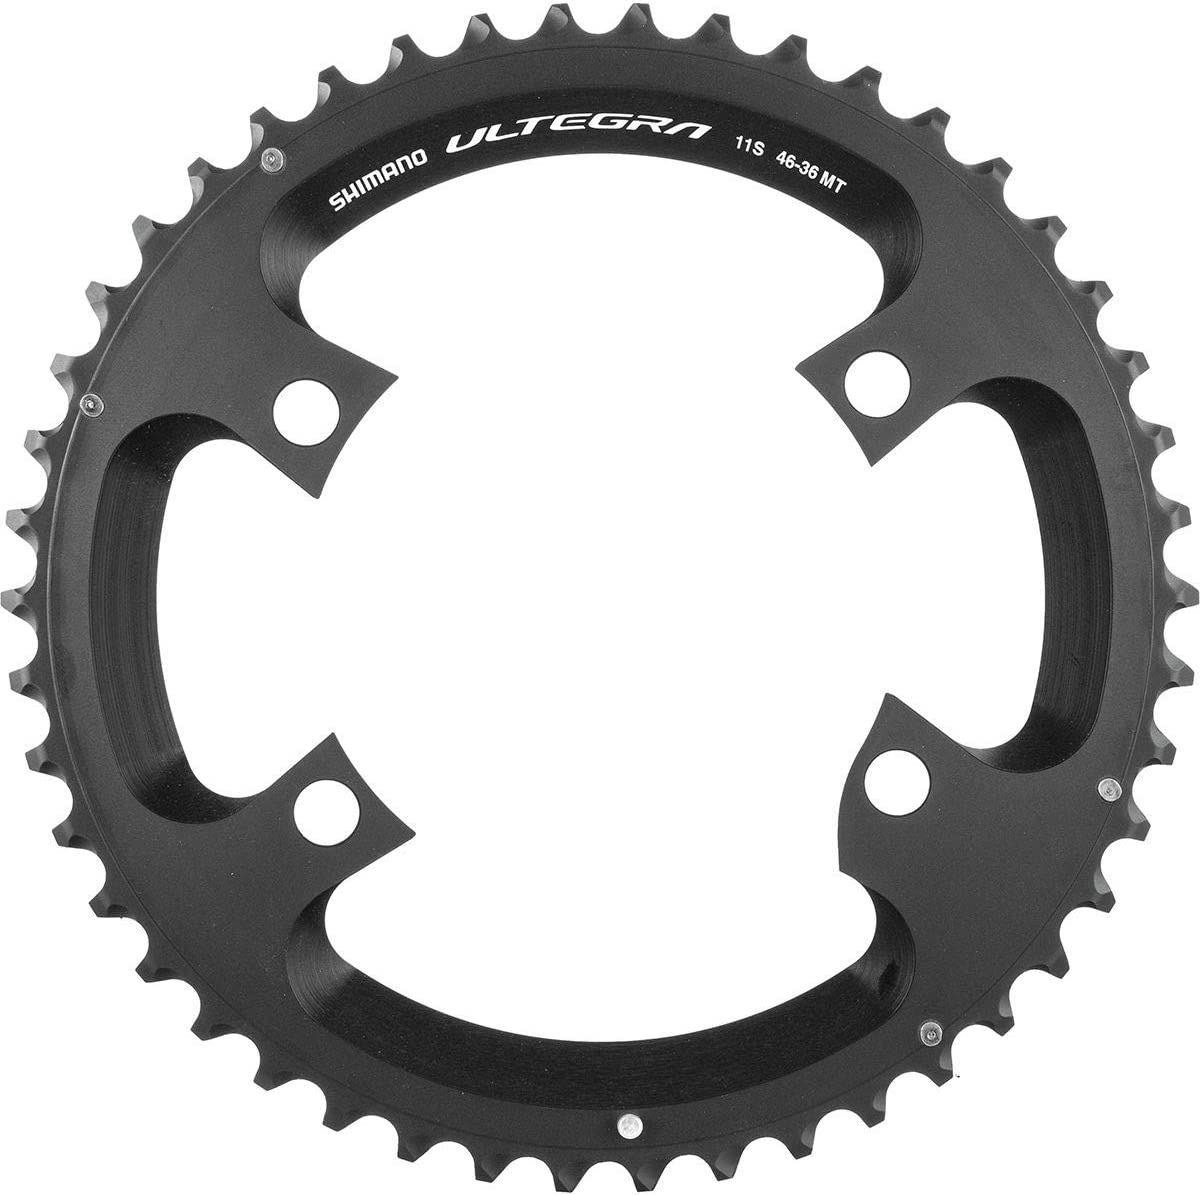 SHIMANO Unisexs FCR8000C04 Bike Parts Standard One